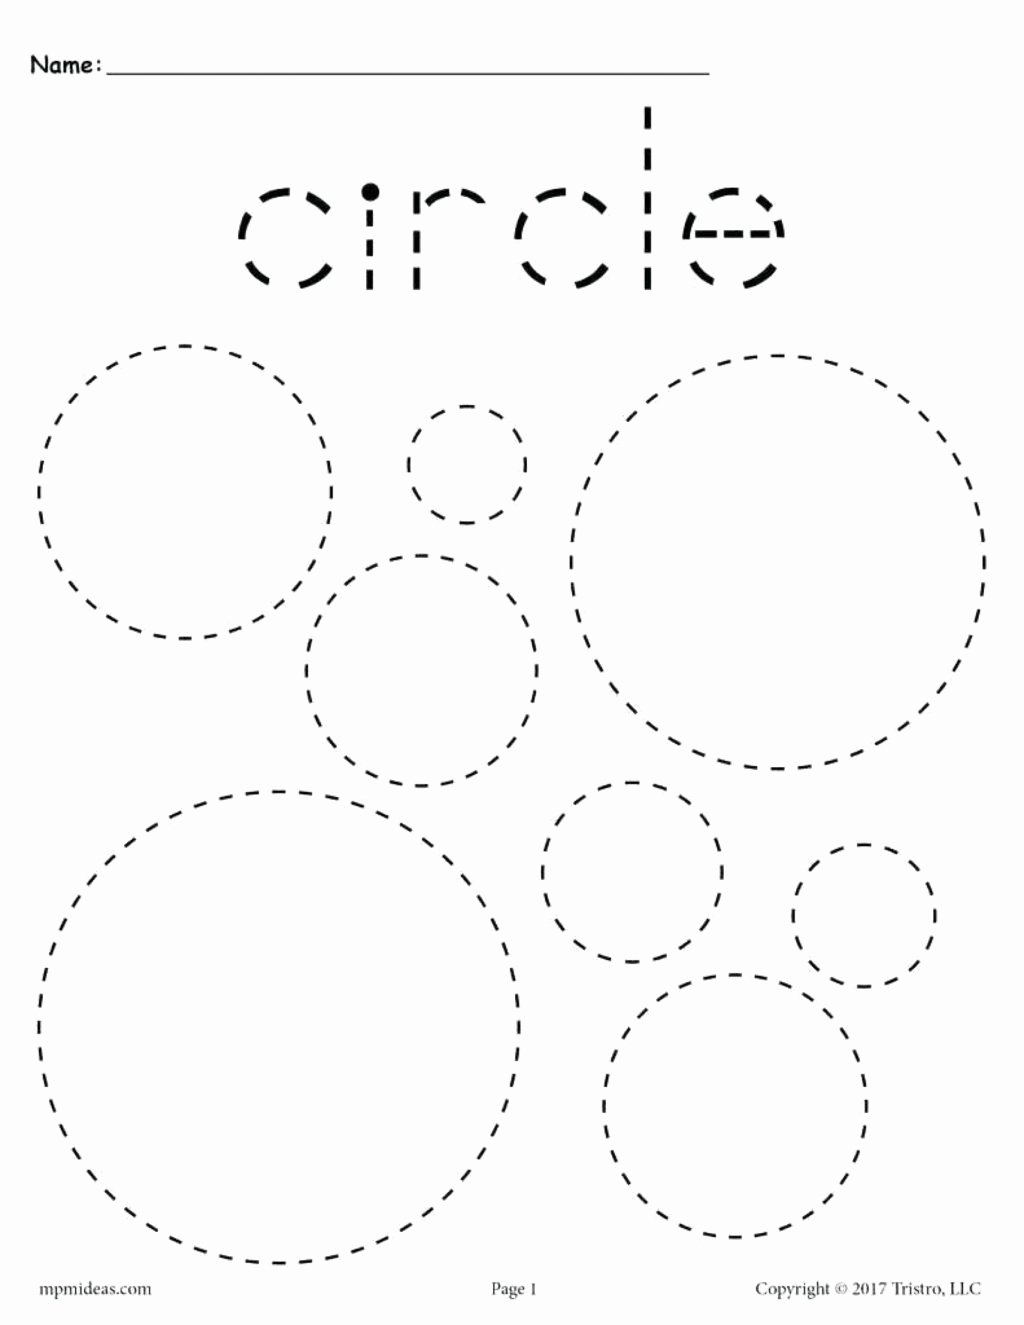 Circle Shape Worksheets for Preschoolers Beautiful Worksheet Worksheet Free Activity Sheets for Preschoolers